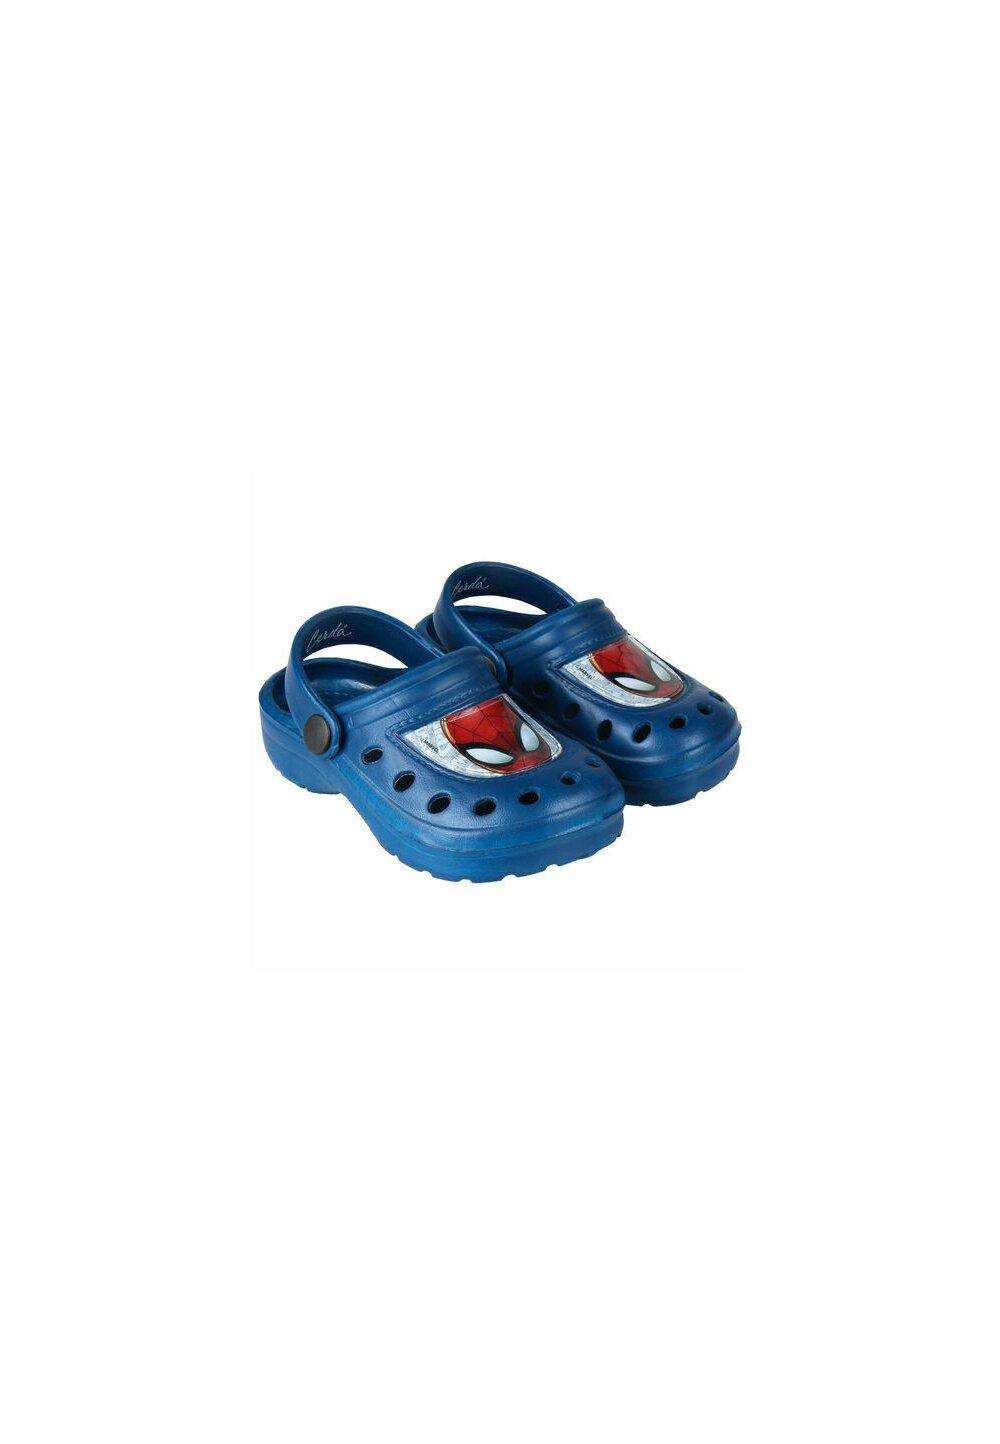 Saboti pentru plaja, Ultimate Spider-Man, albastri imagine